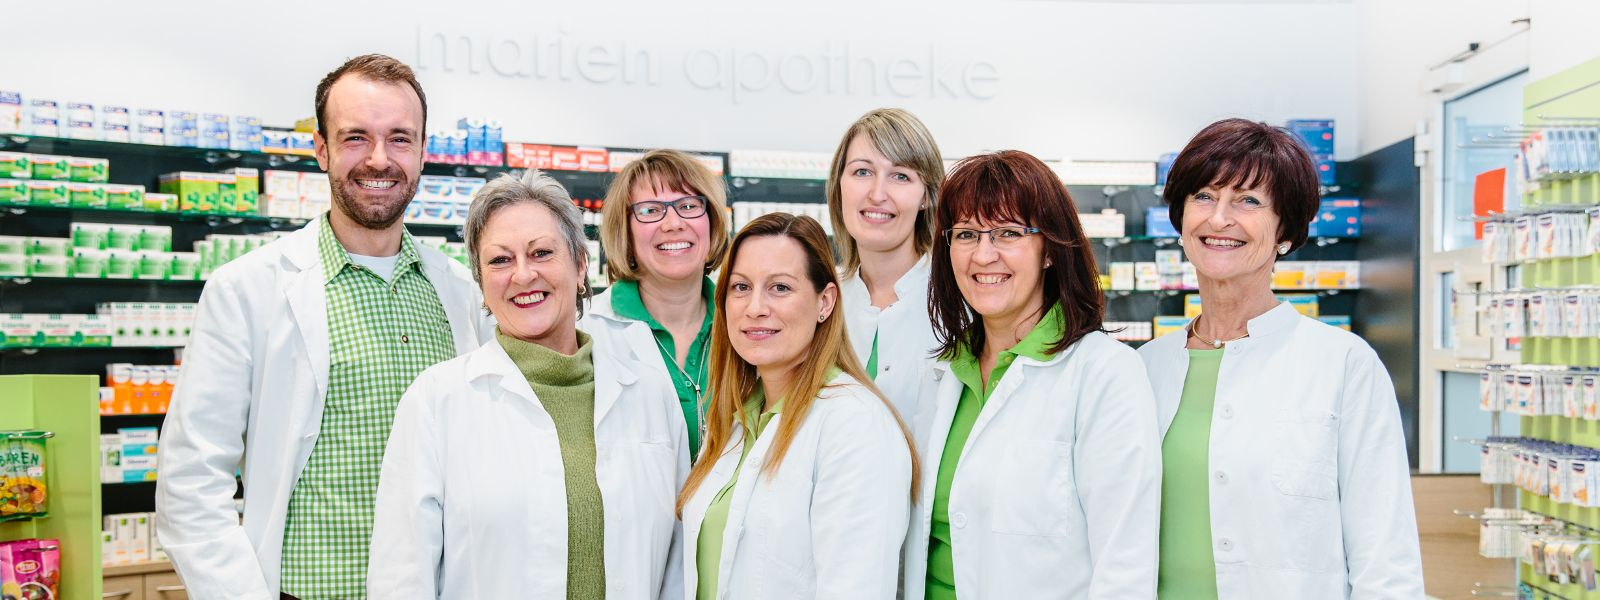 marienapotheke-team